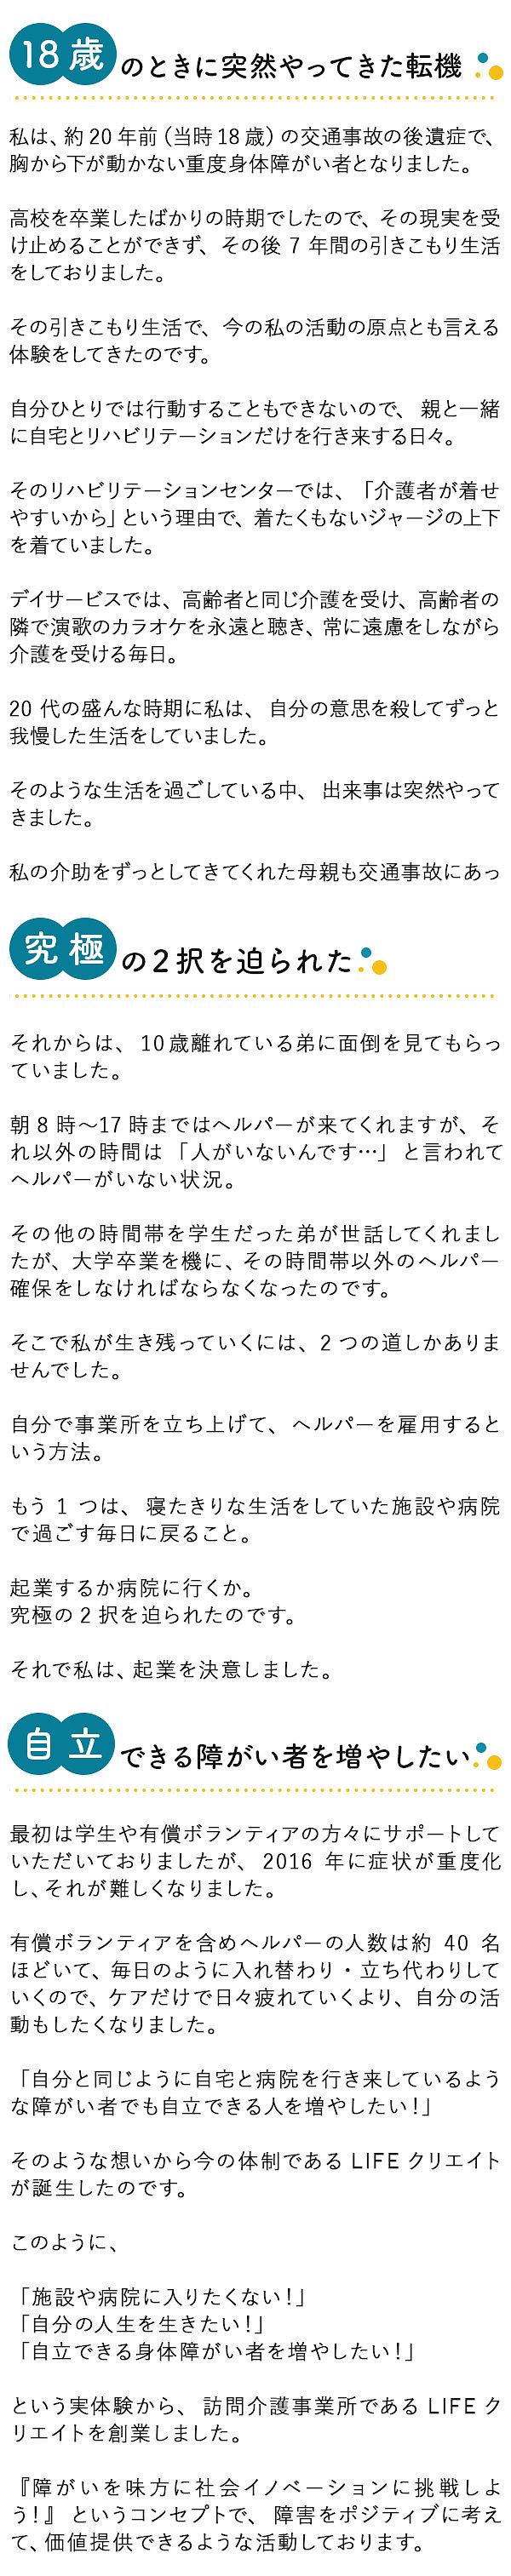 lp_sp_06.jpg